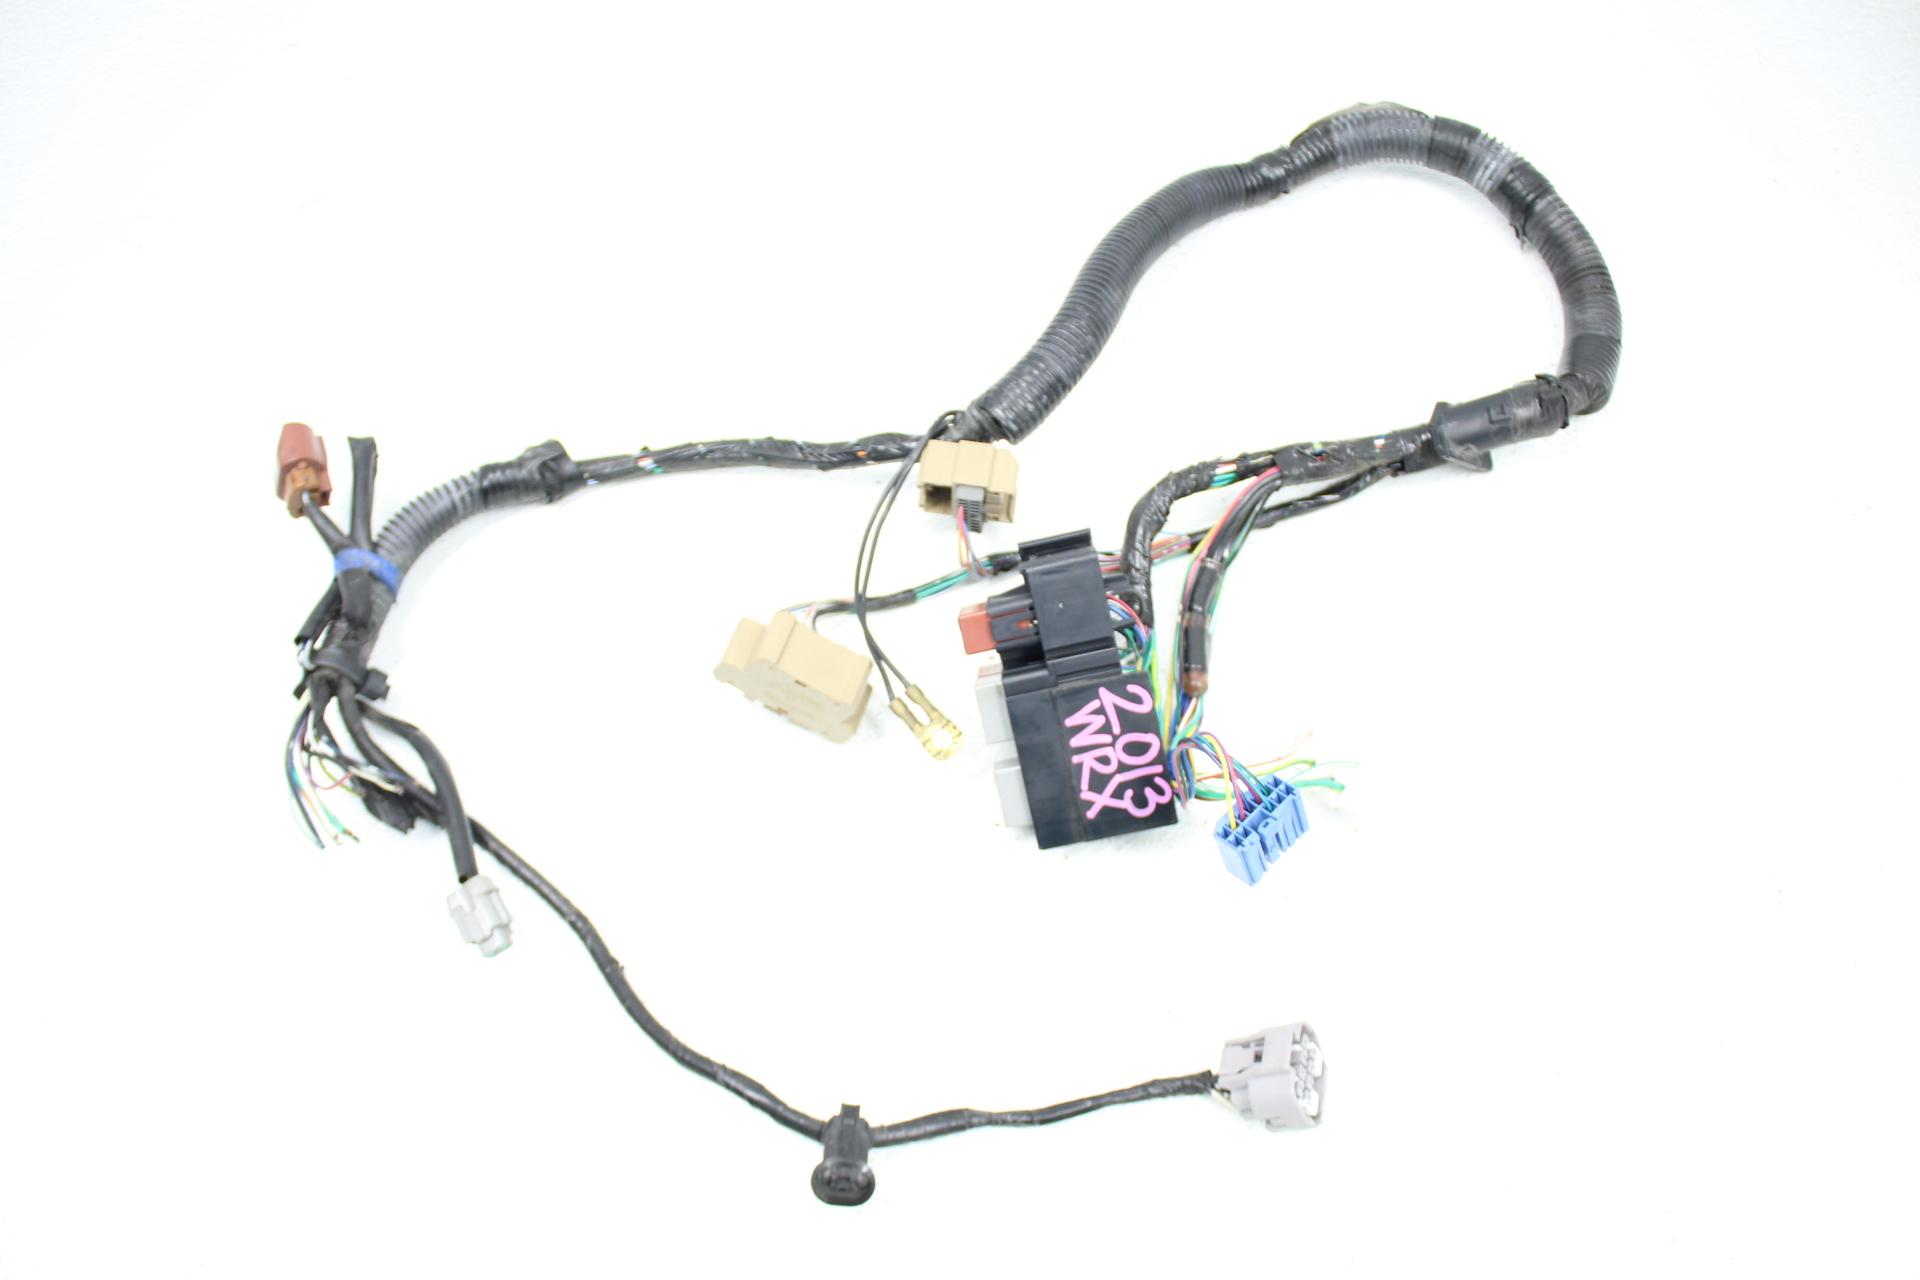 Subaru Wrx Sti Fuse Box Wire Wiring Harness Oem